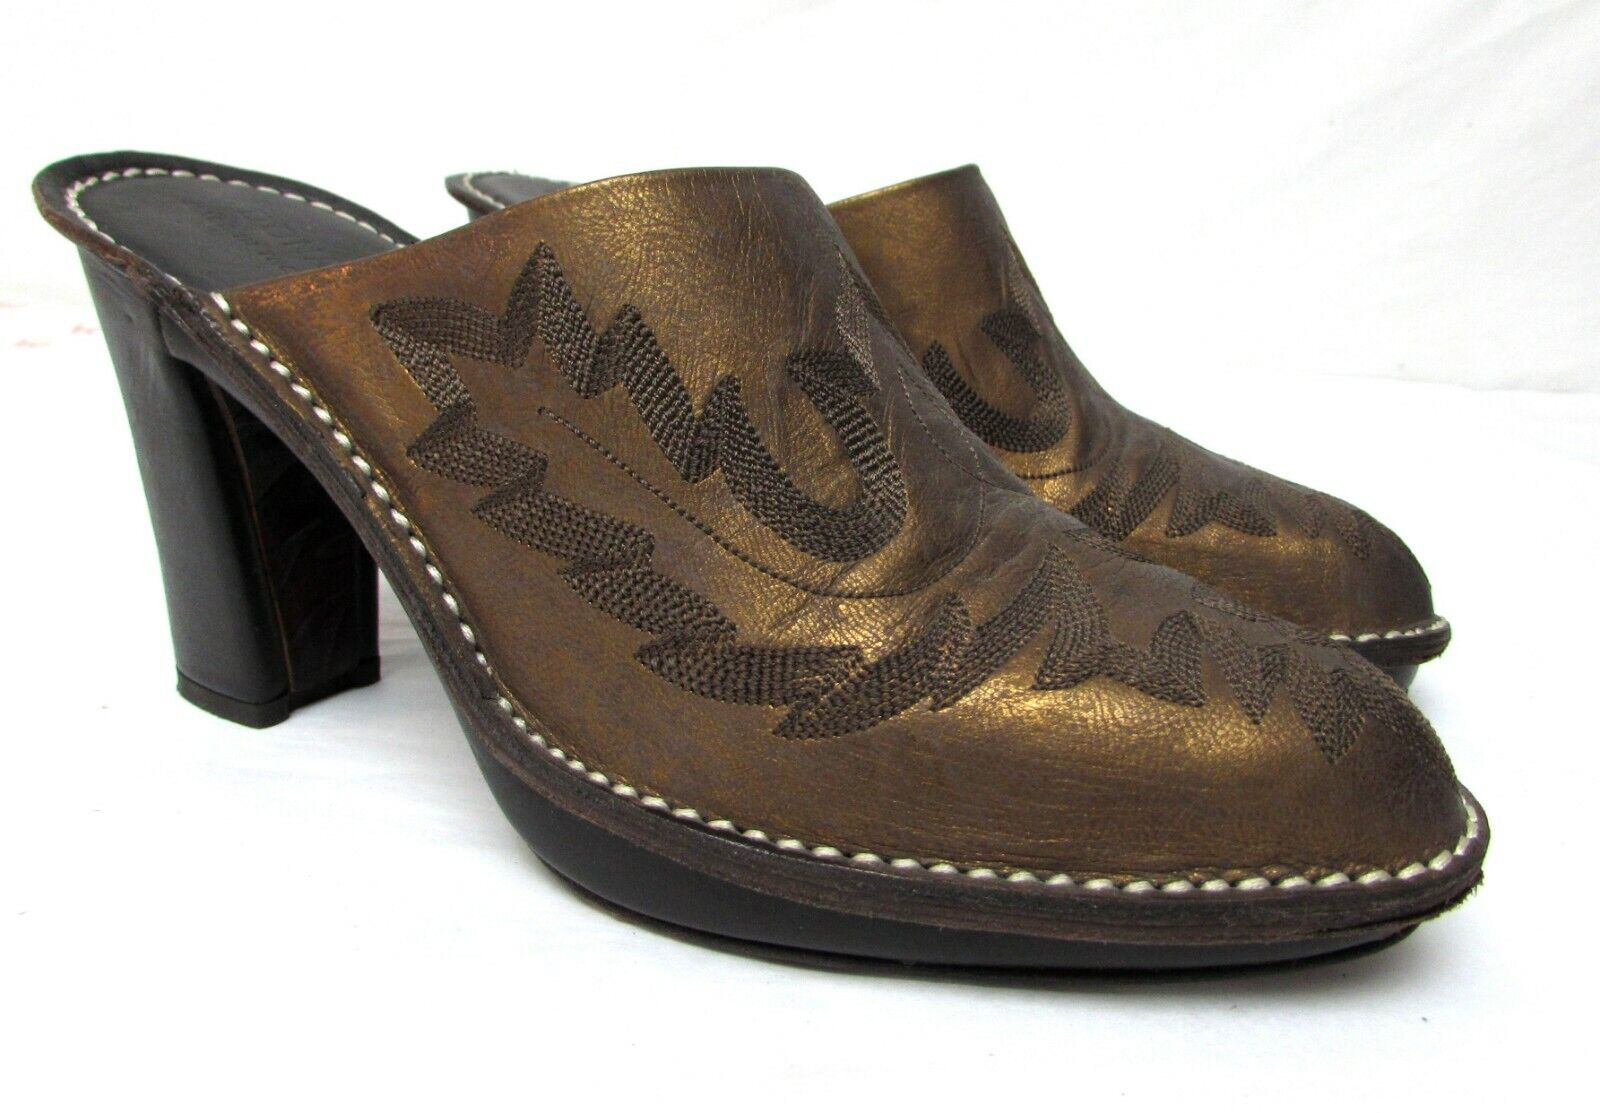 Donald J. Pliner women's size 7 N Narrow western clogs boots mules Bozza bronze